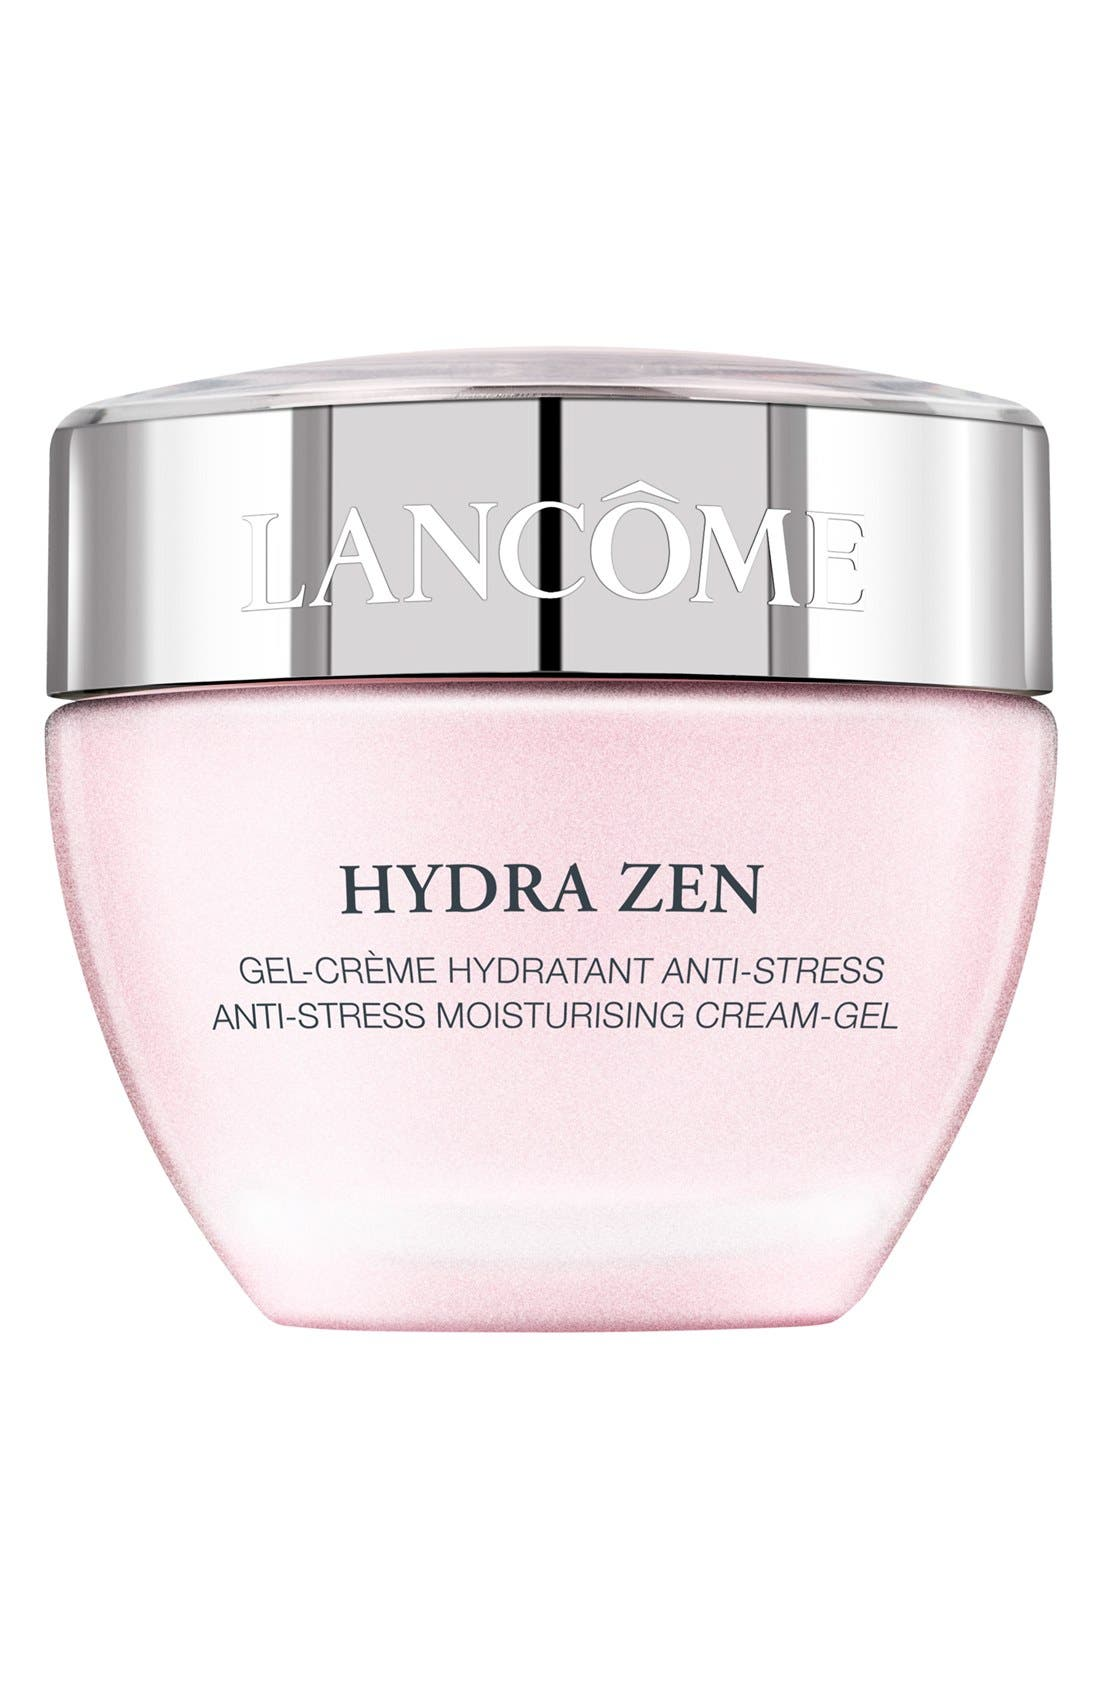 Lancome Hydra Zen Anti-Stress Moisturizing Cream-Gel